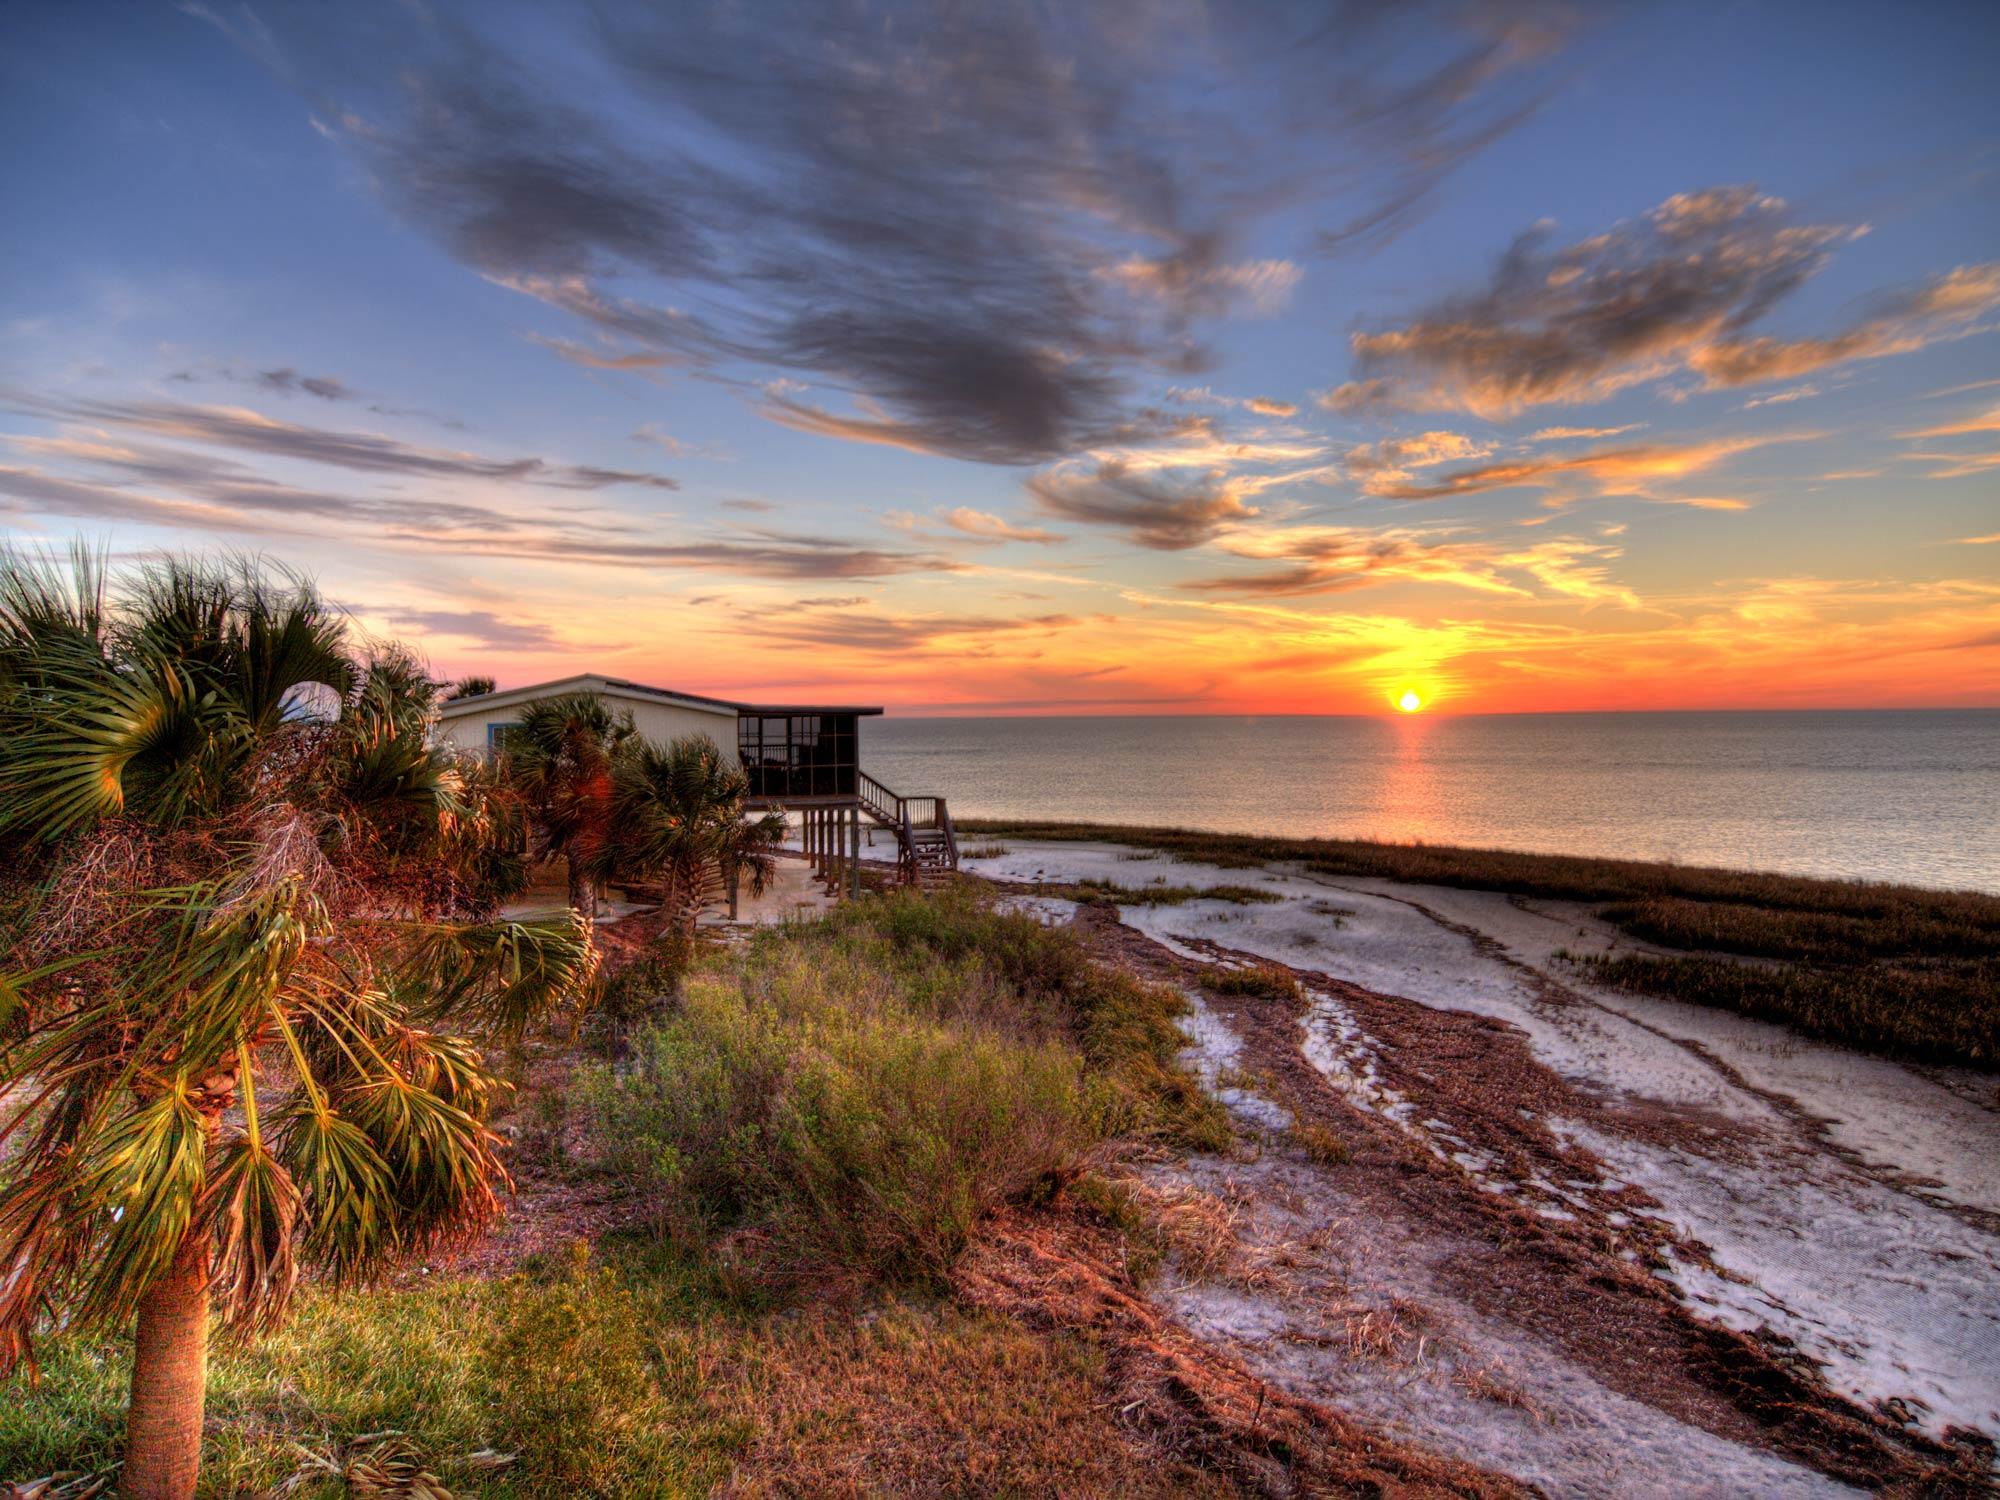 A coastal florida home overlooking the Gulf